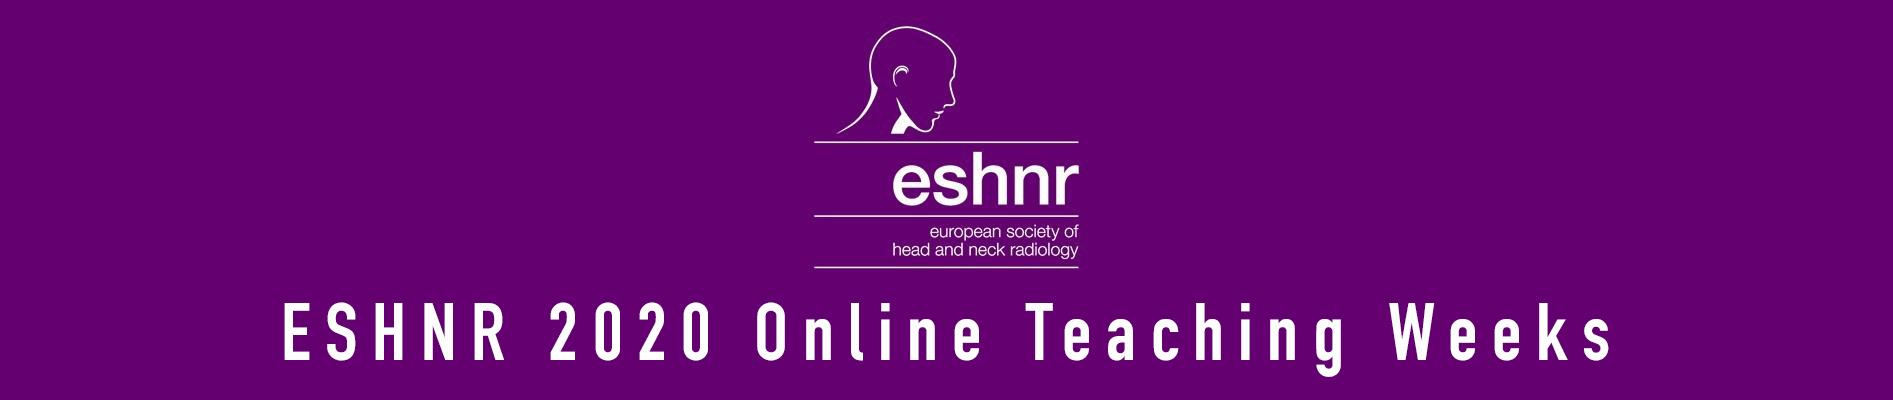 ESHNR 2020 Online Teaching Weeks